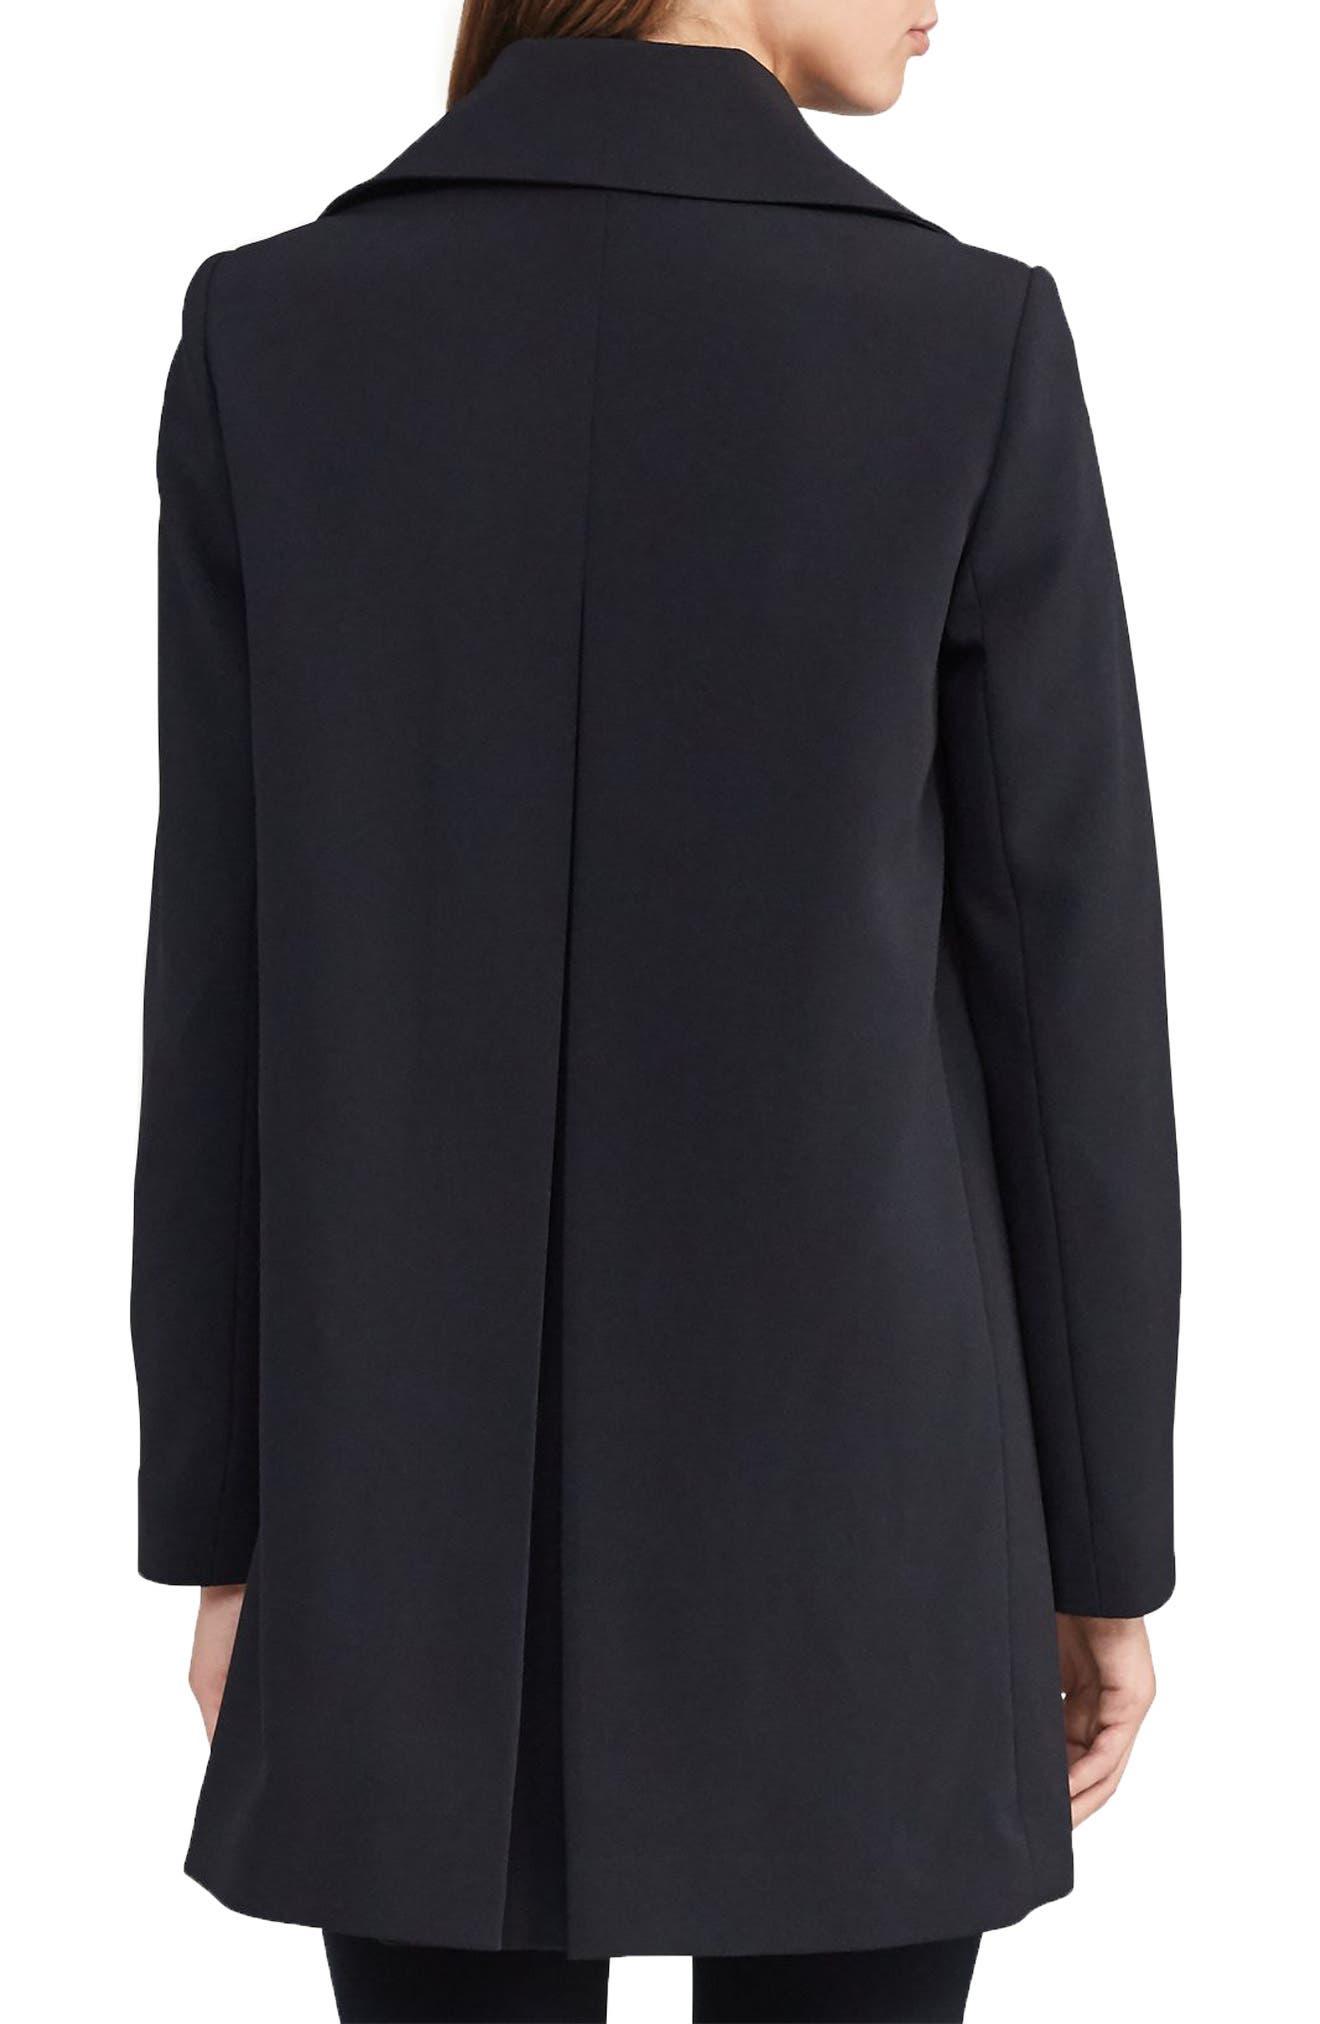 Crepe Jacket,                             Alternate thumbnail 2, color,                             Black